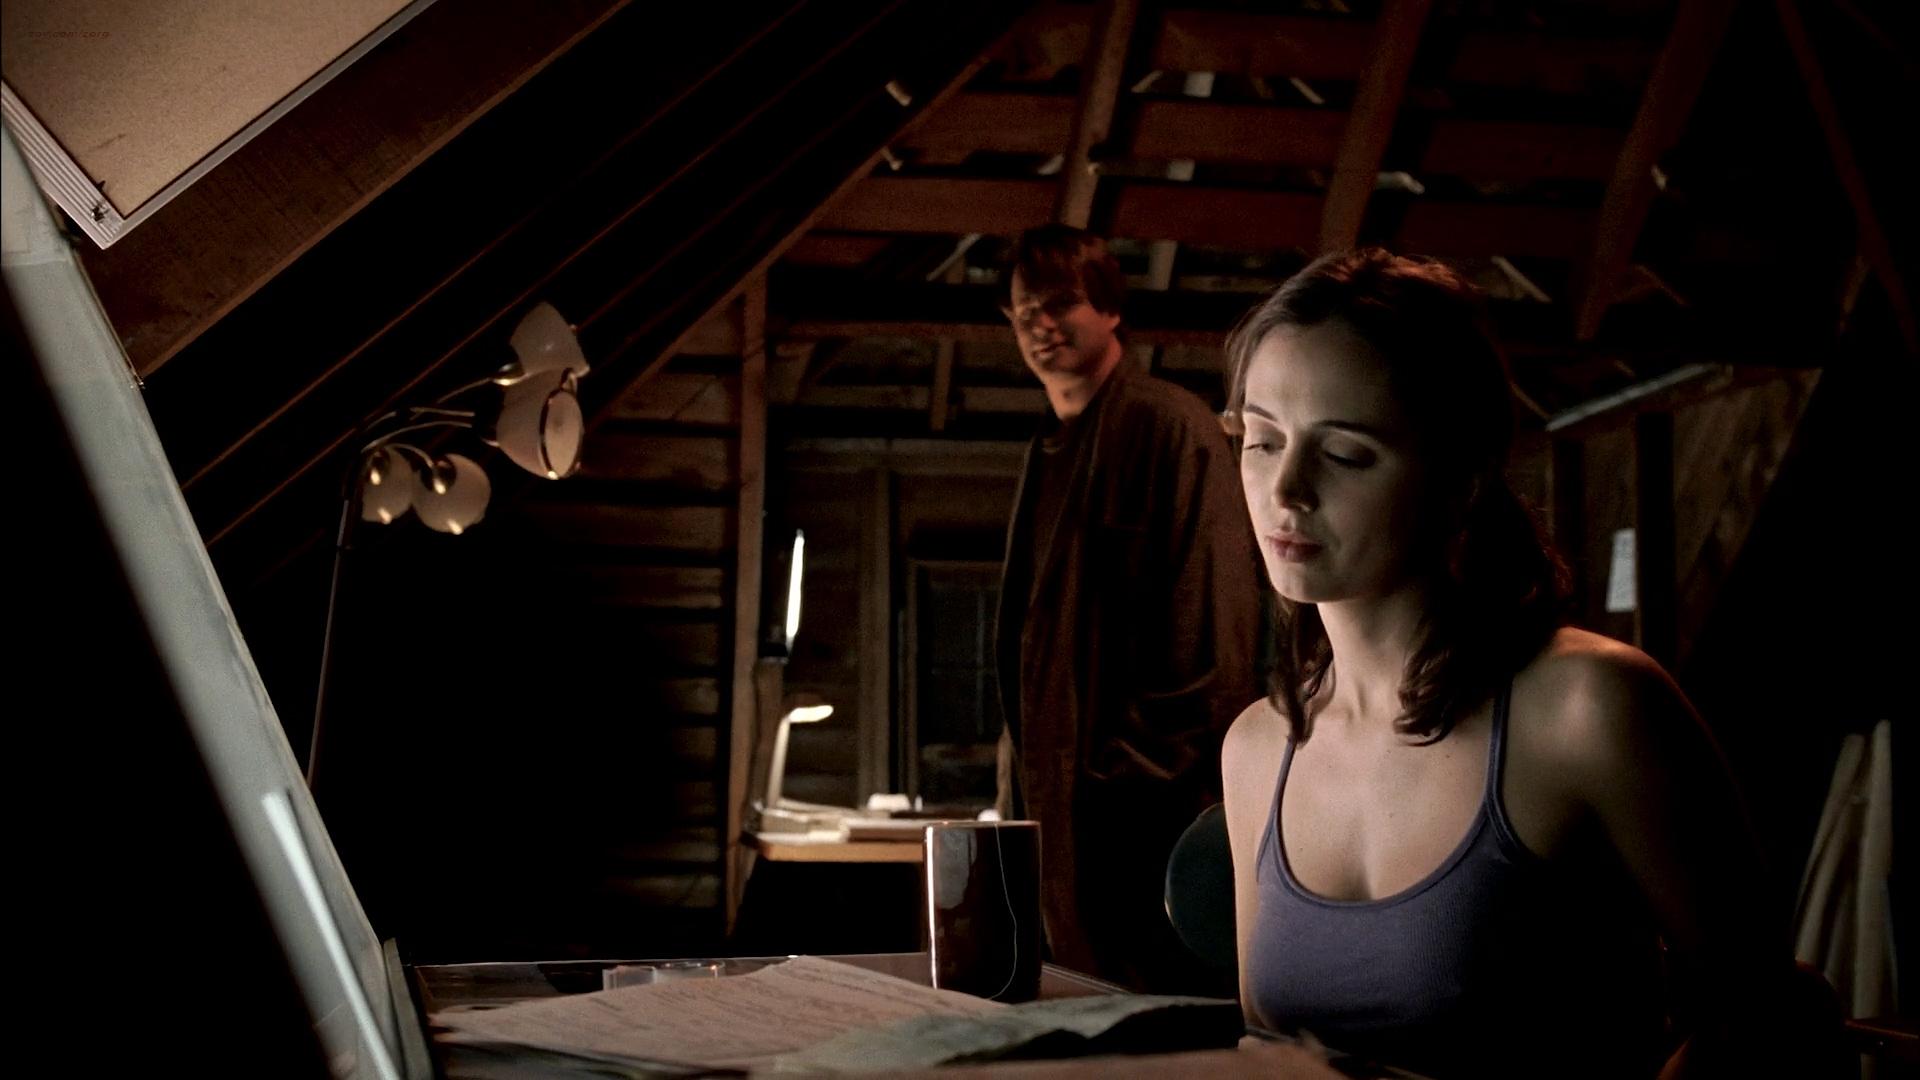 Eliza Dushku nude brief topless - The Alphabet Killer (2008) HD 1080p BluRay (6)